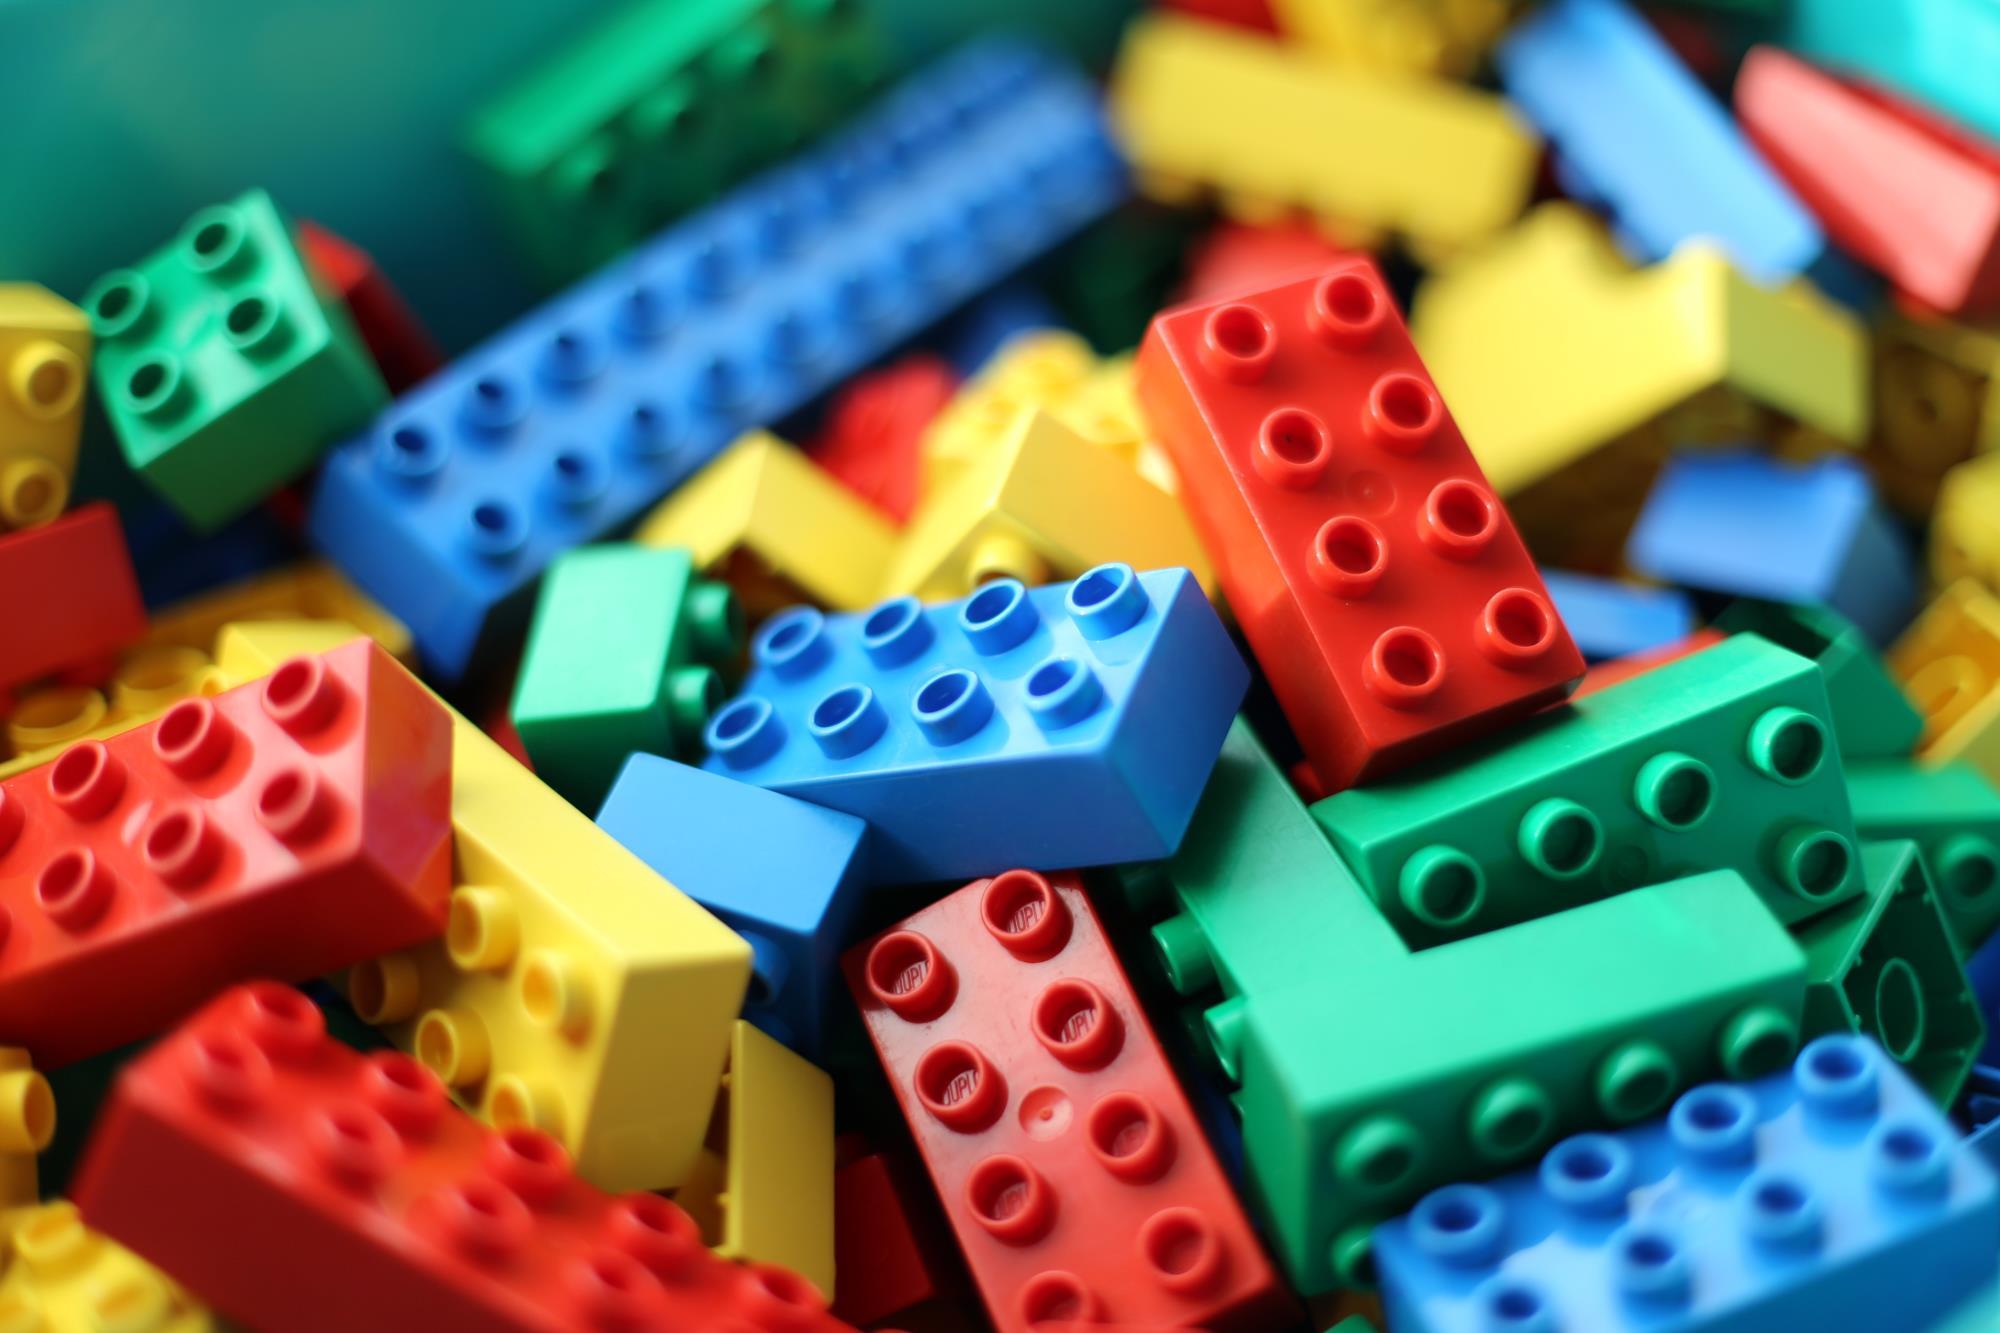 Main Lego Club Library City Of South San Francisco